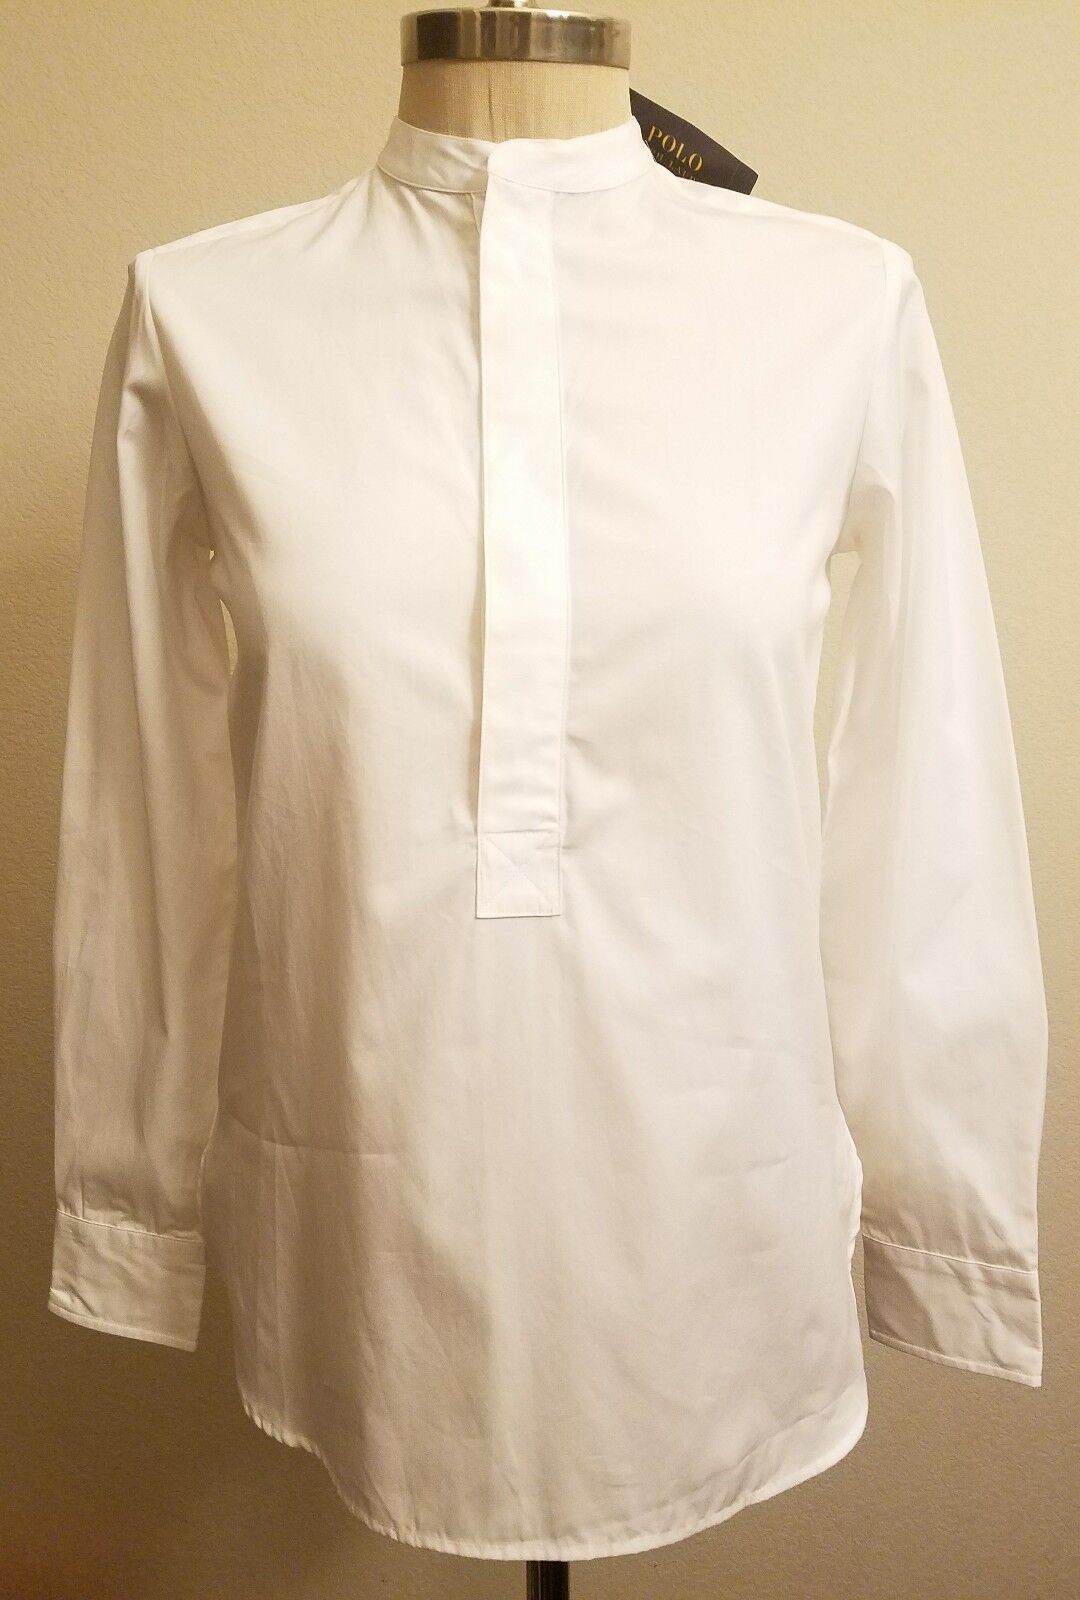 Polo Ralph Lauren damen Mandarin Collar Tunic Long Sleeve ShirtSz XS THESPOT917